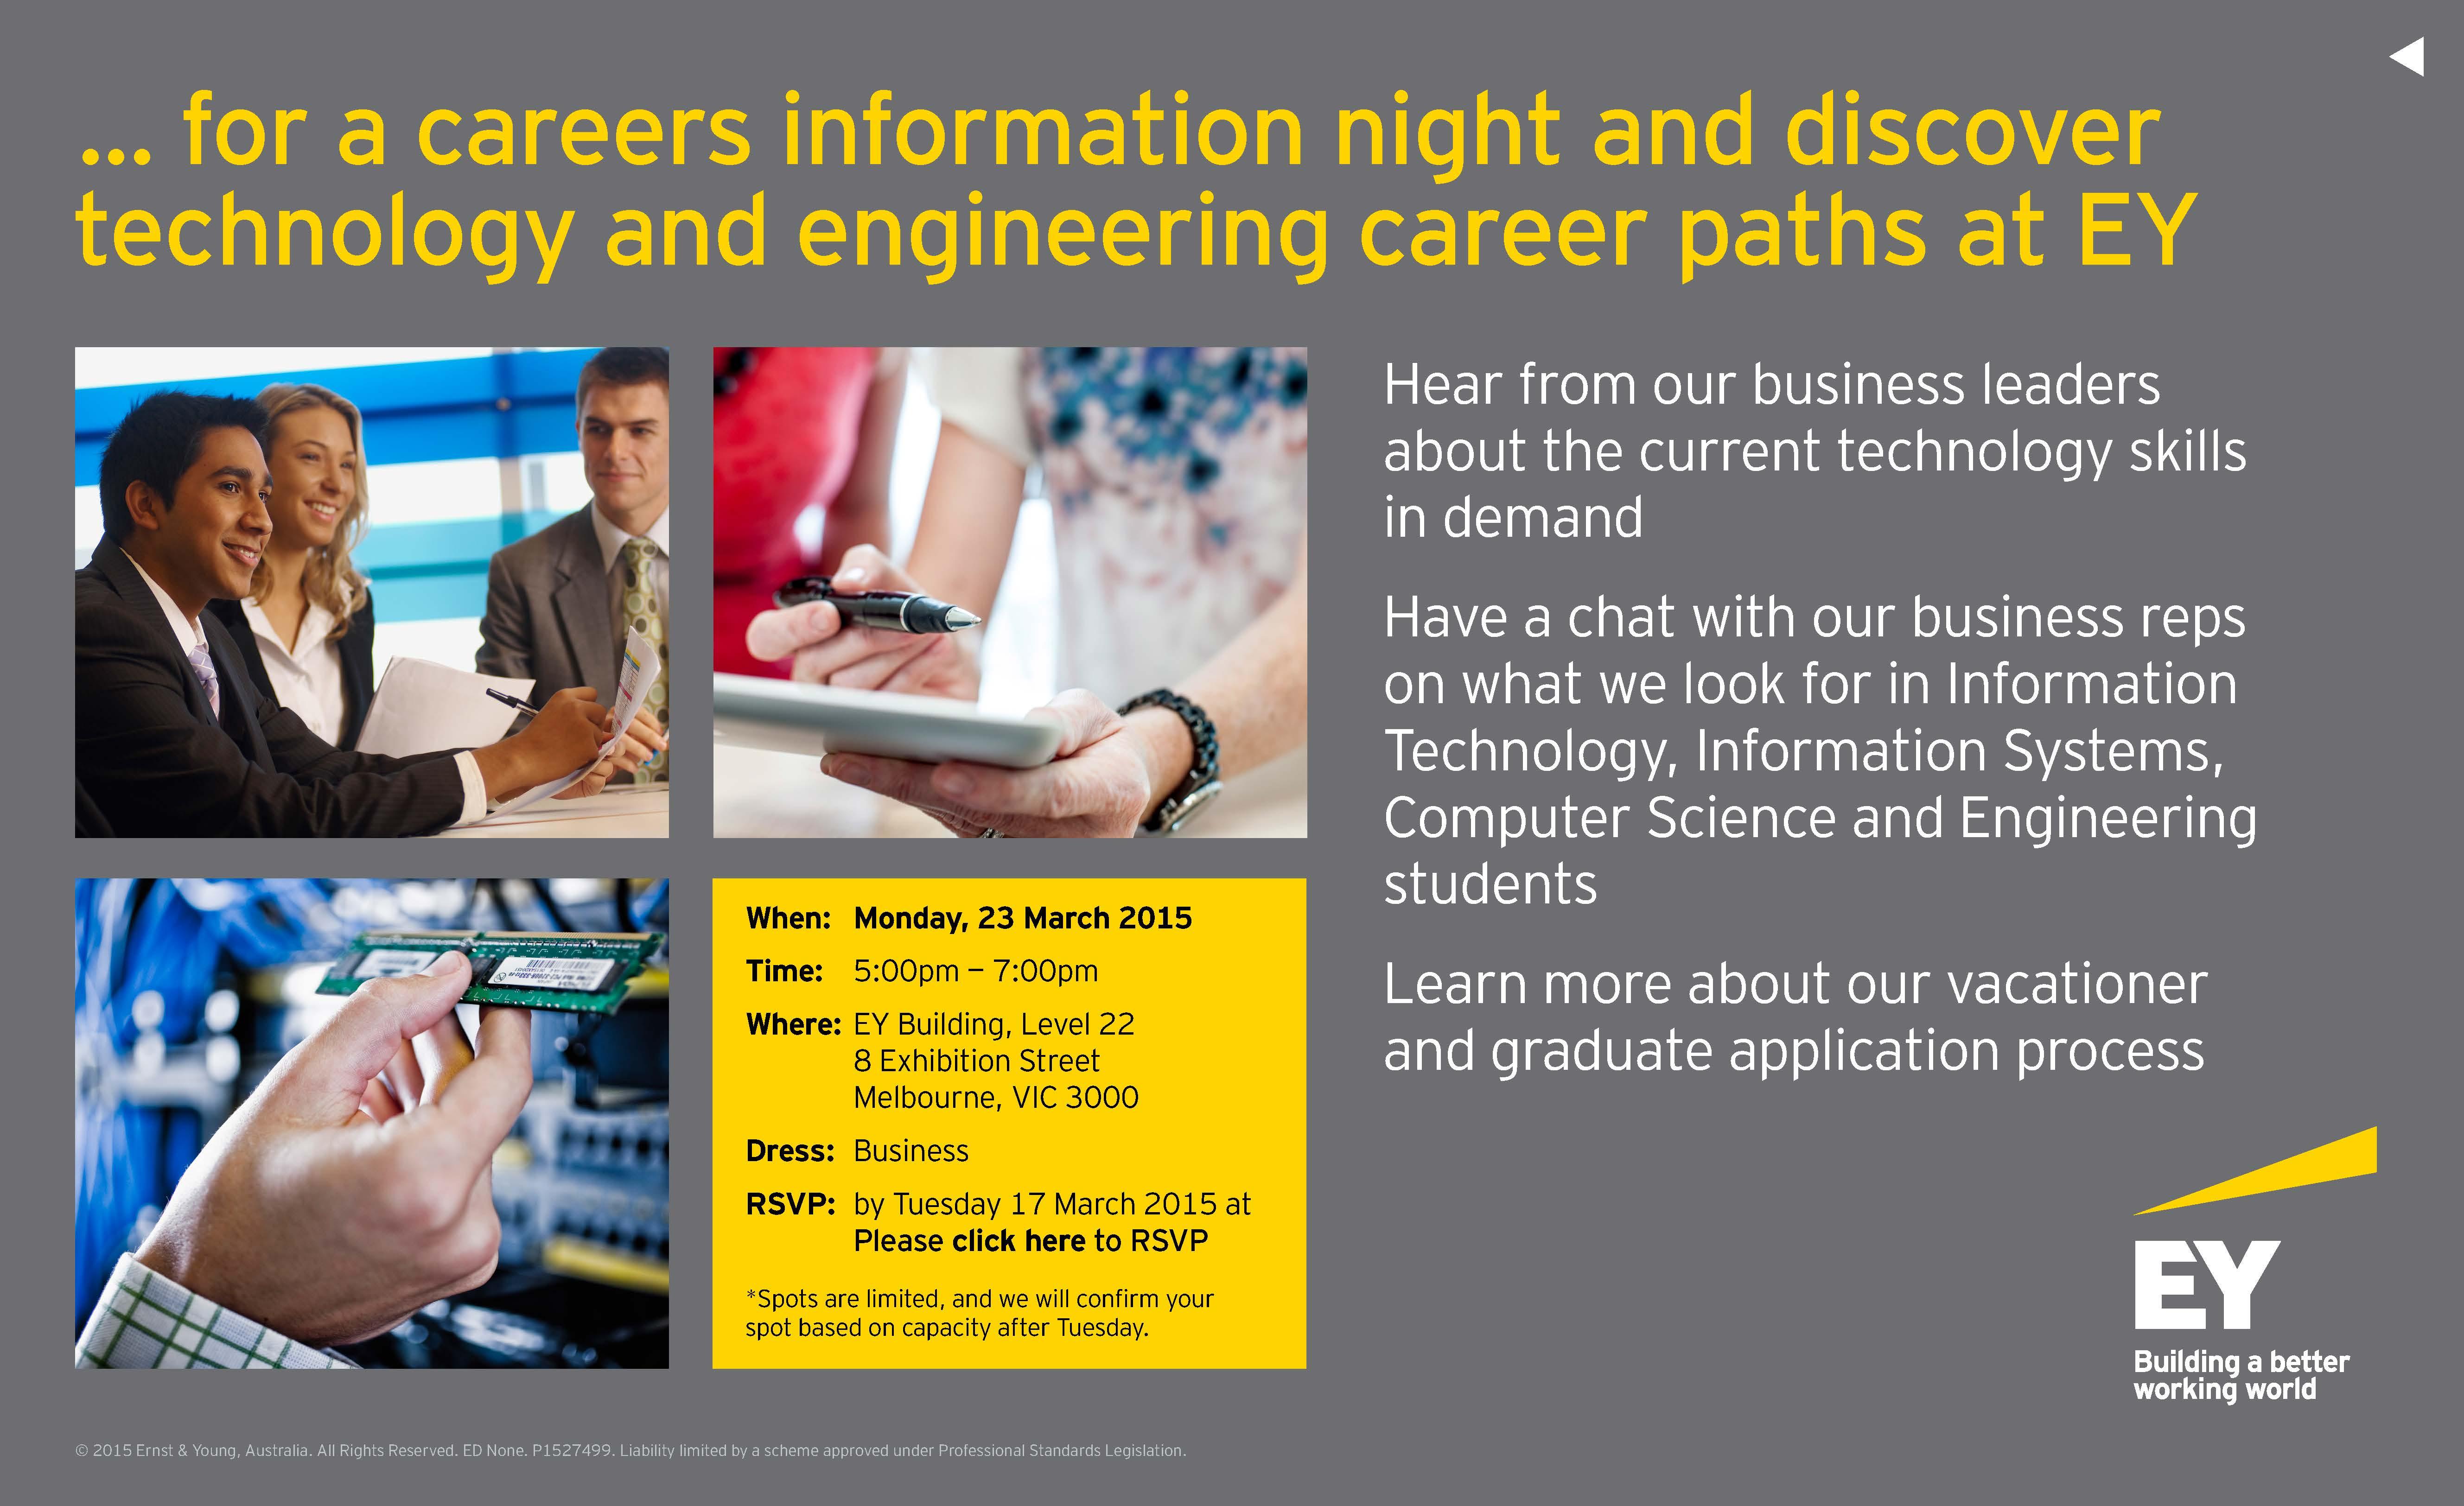 Engineering & IT CareersOnline | Invitation: EY: Careers for